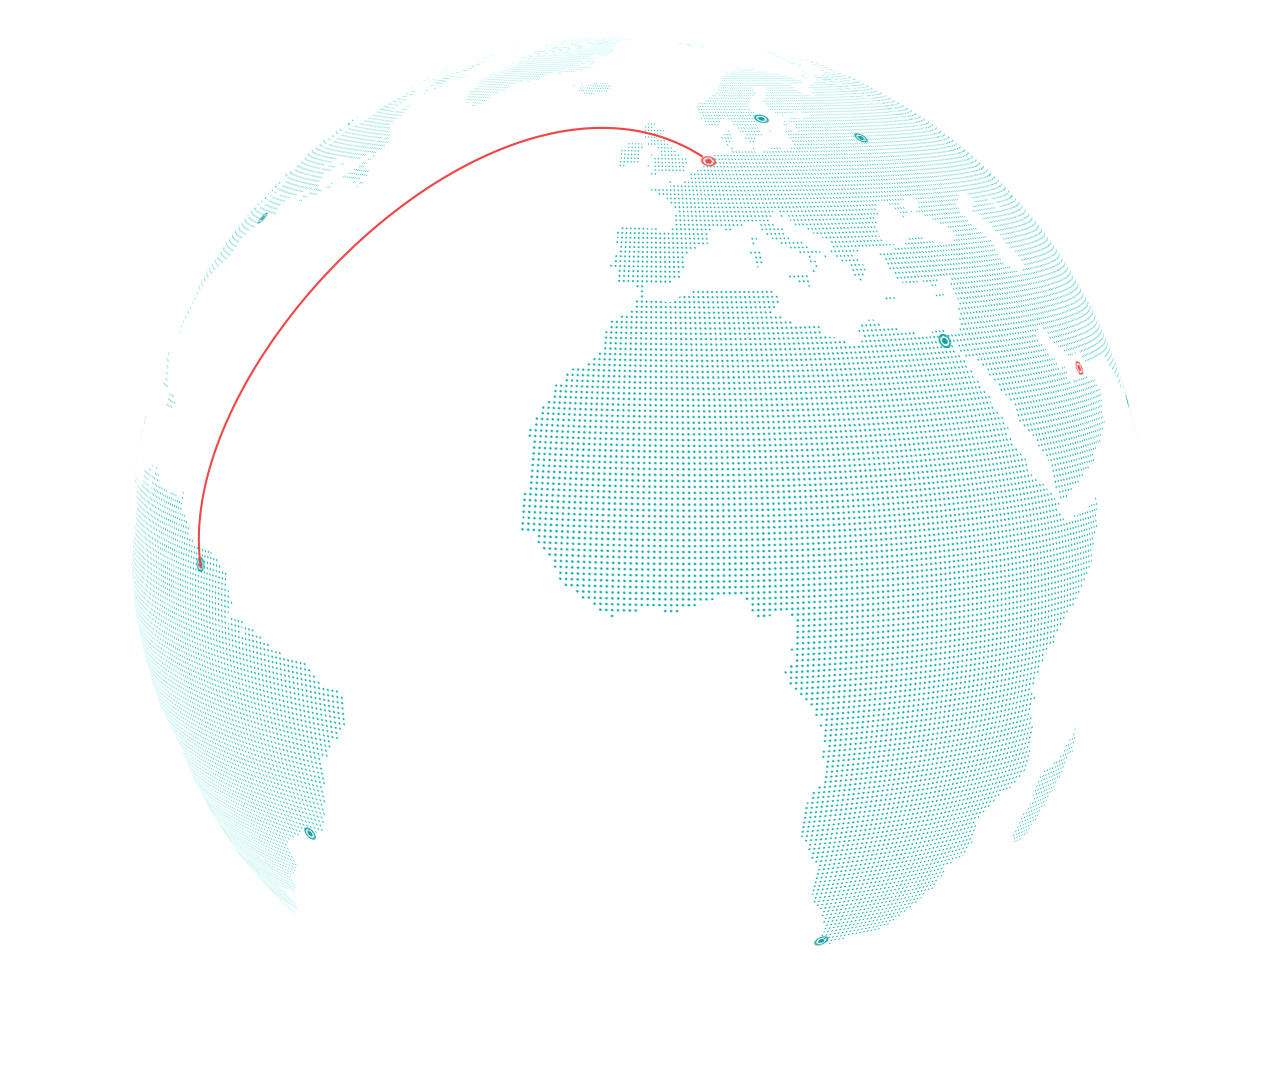 Qlick world map connecting dots